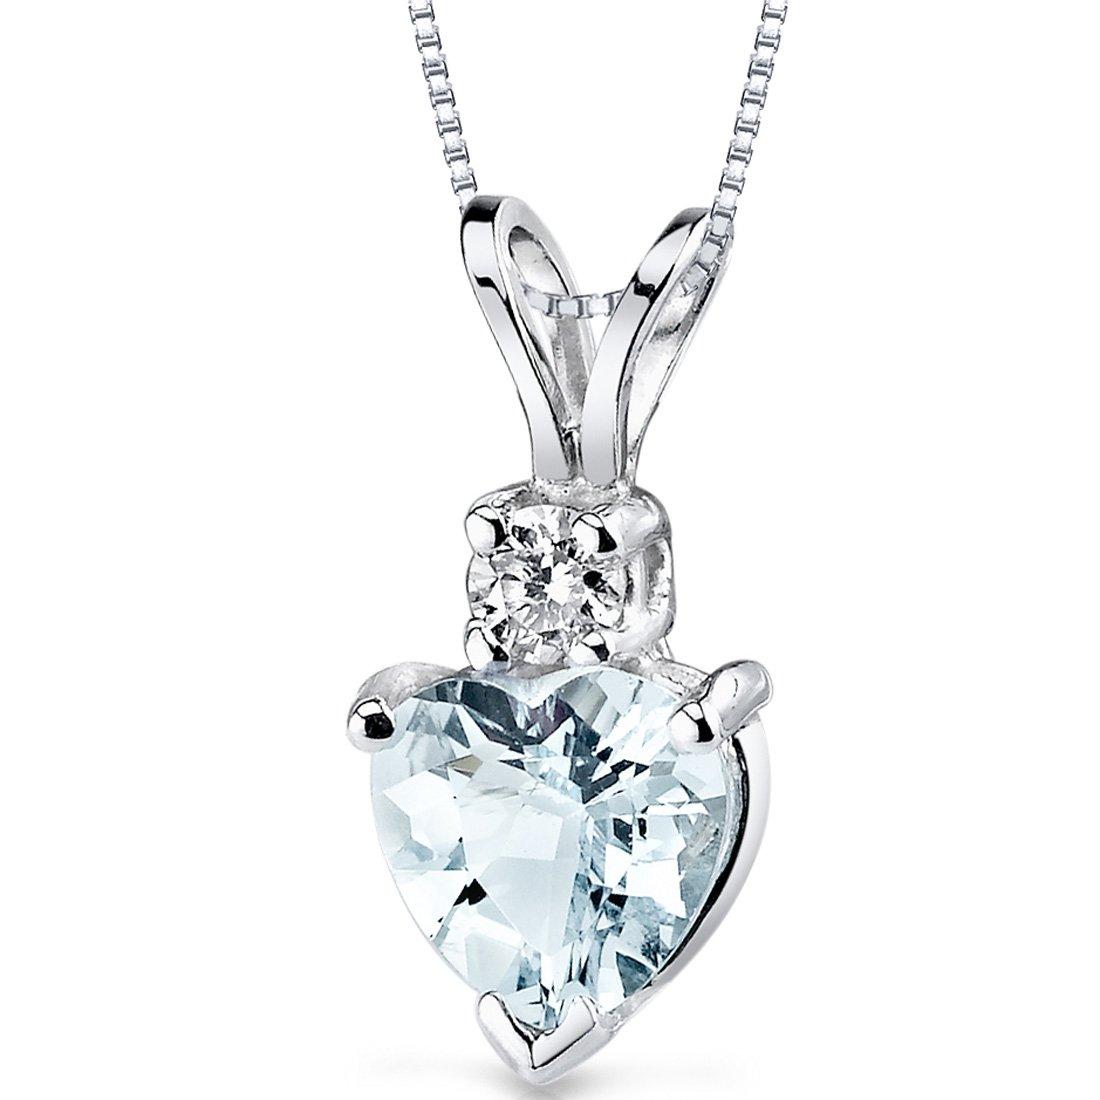 14 Karat White Gold Heart Shape 0.75 Carats Aquamarine Diamond Pendant by Peora